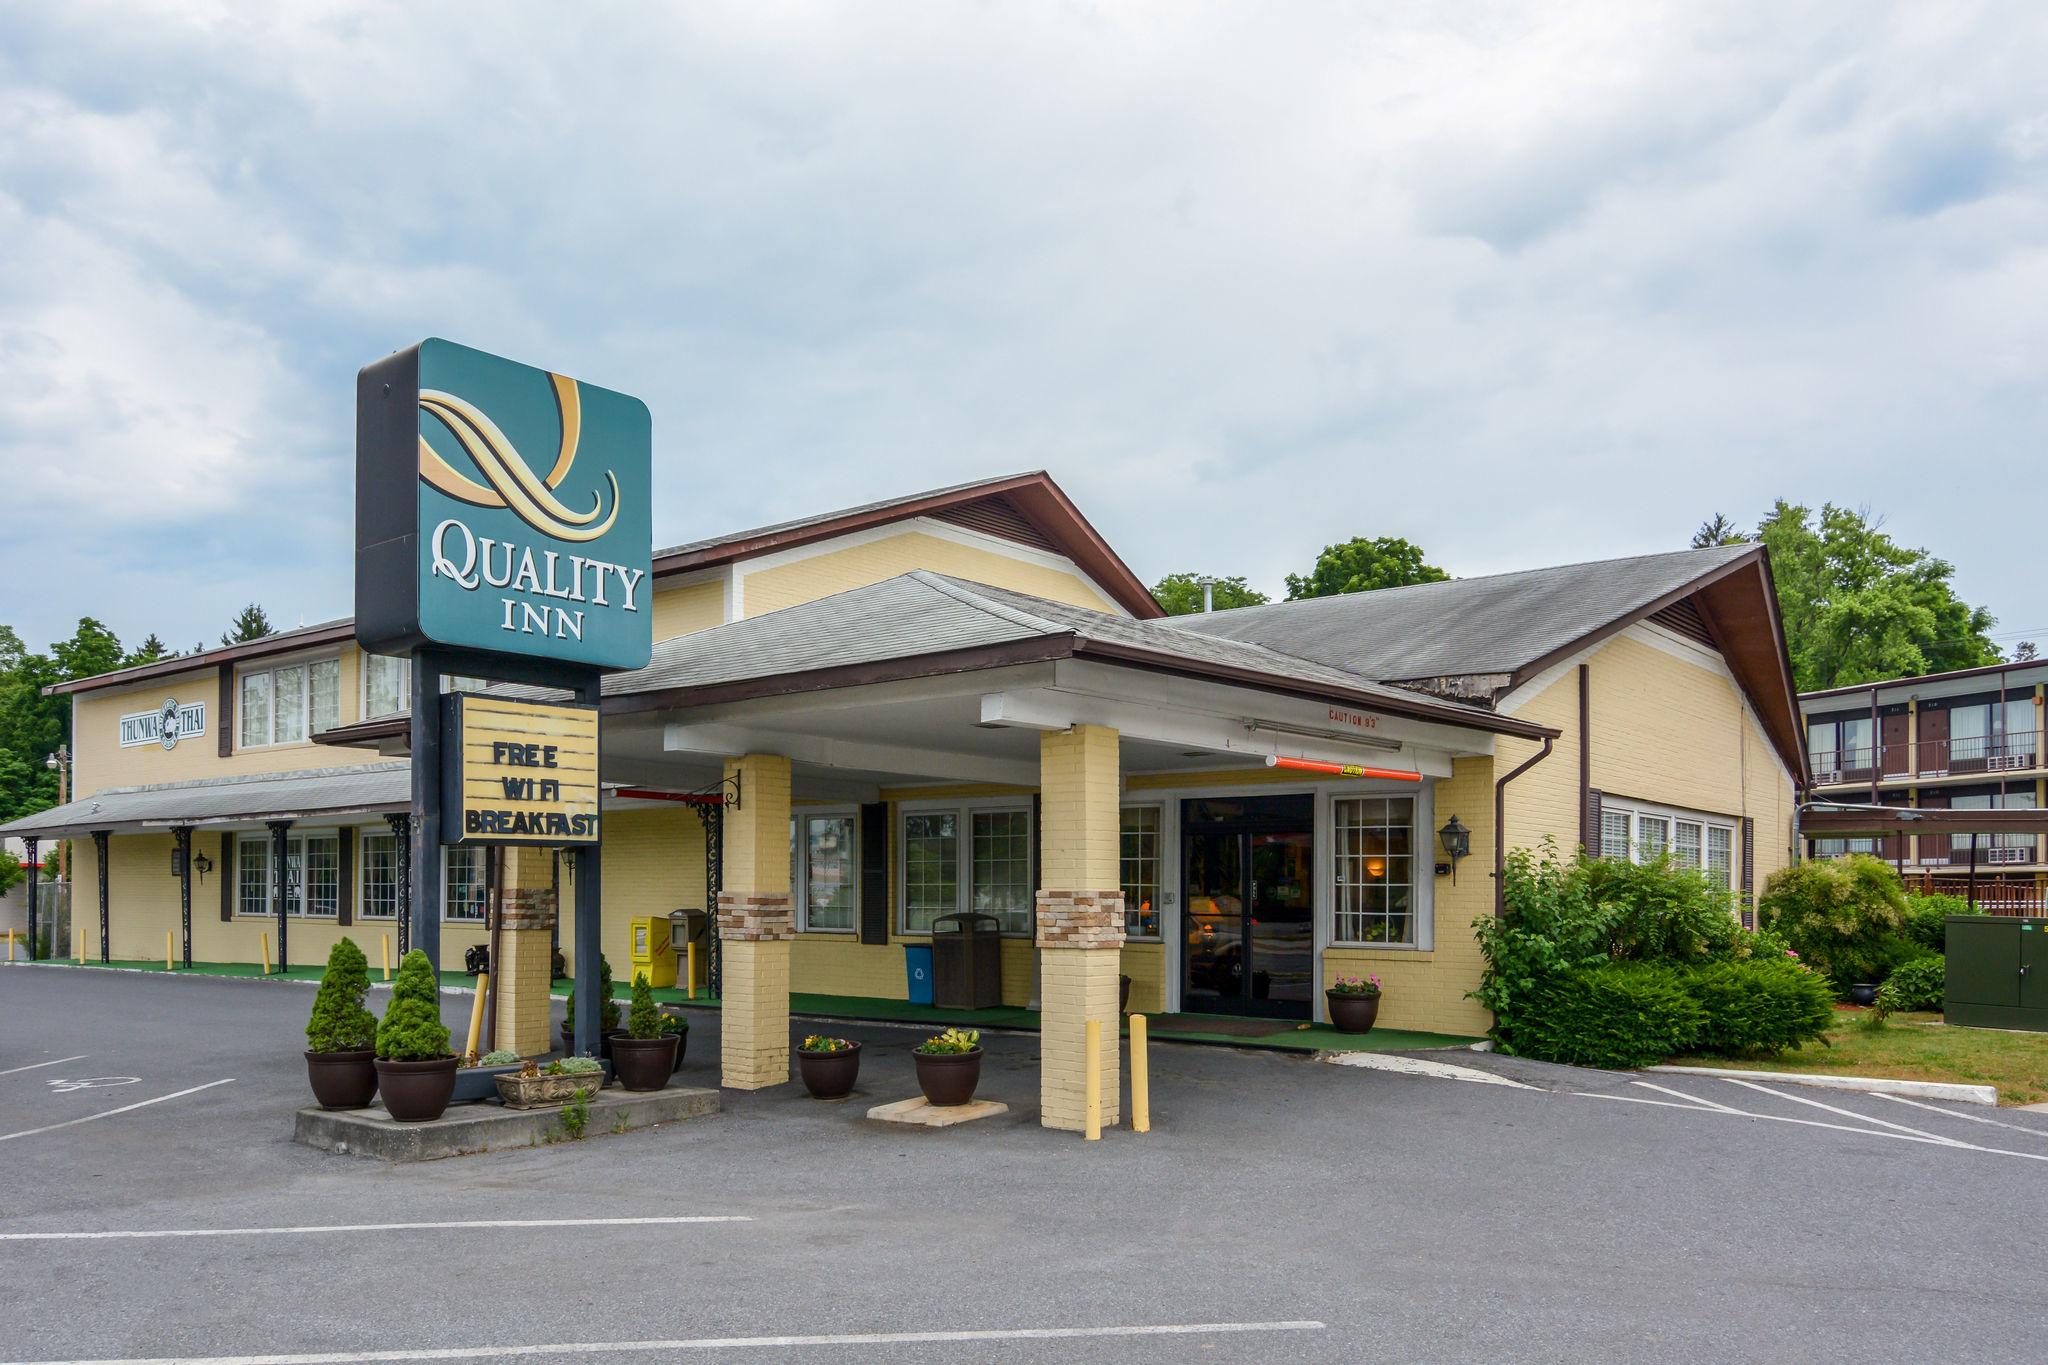 Quality Inn Skyline Drive image 0